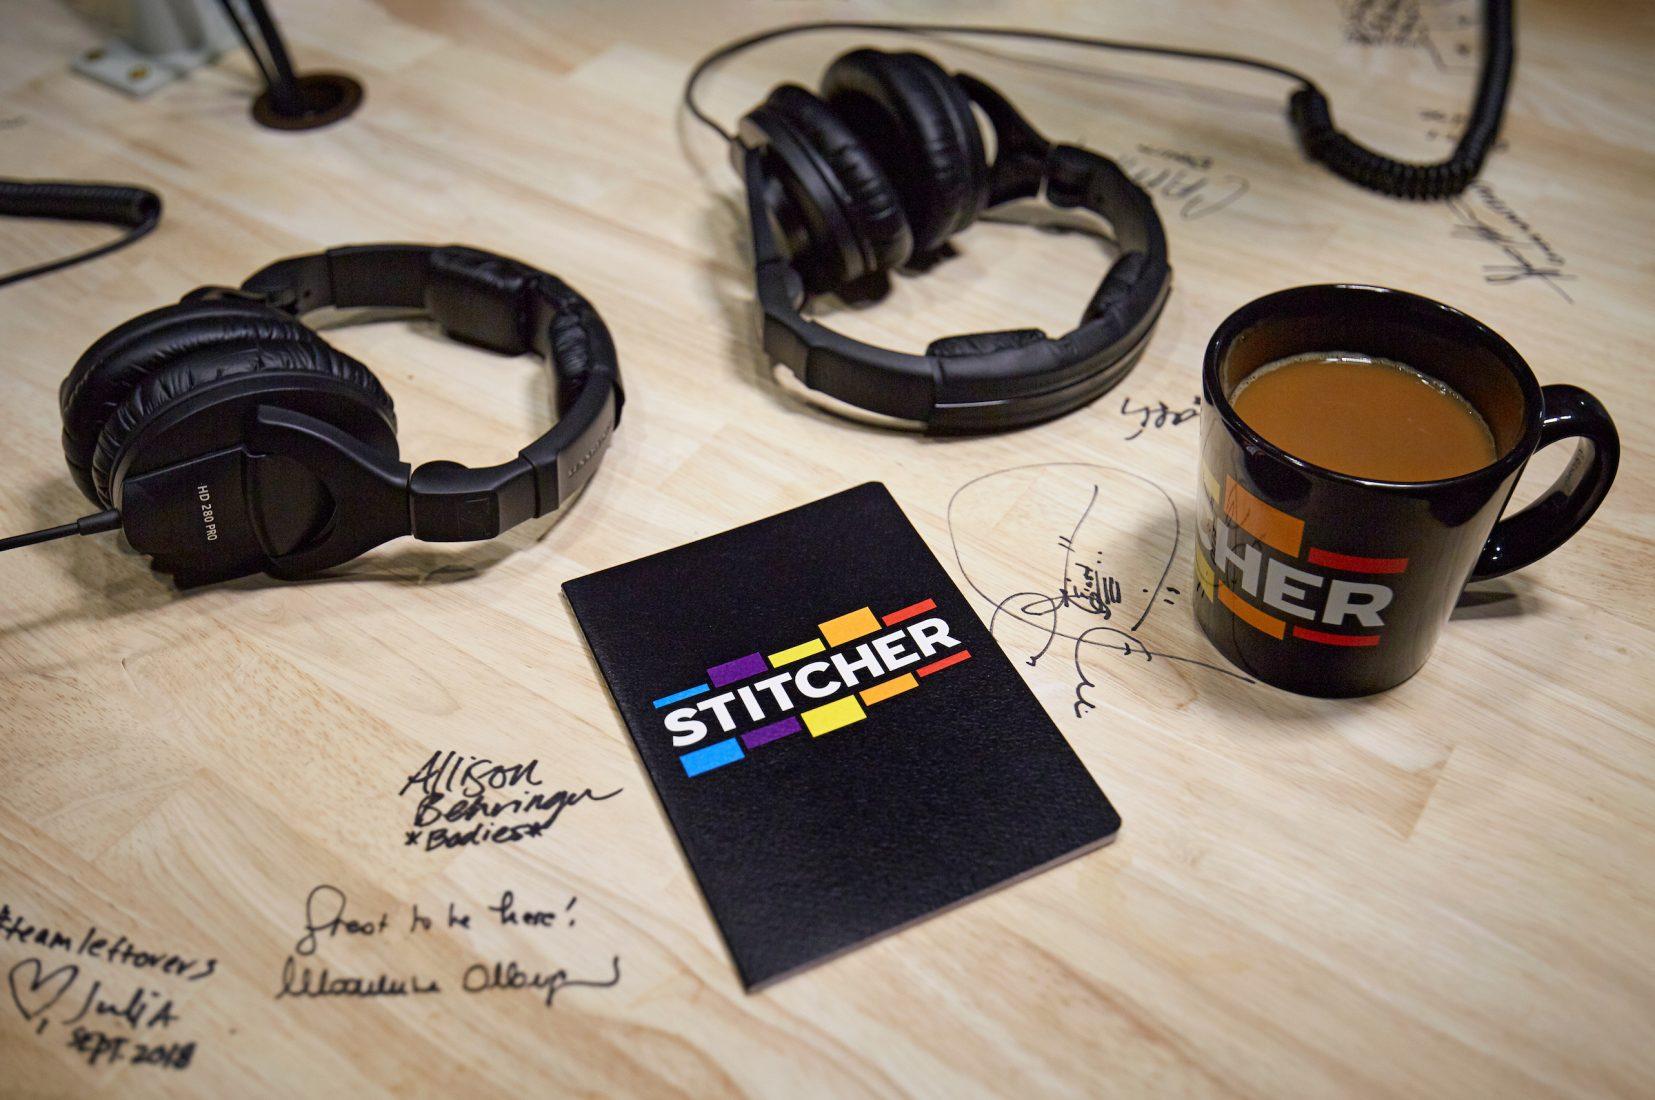 Stitcher Radio NYC Partners With WSDG For Next Level Sound